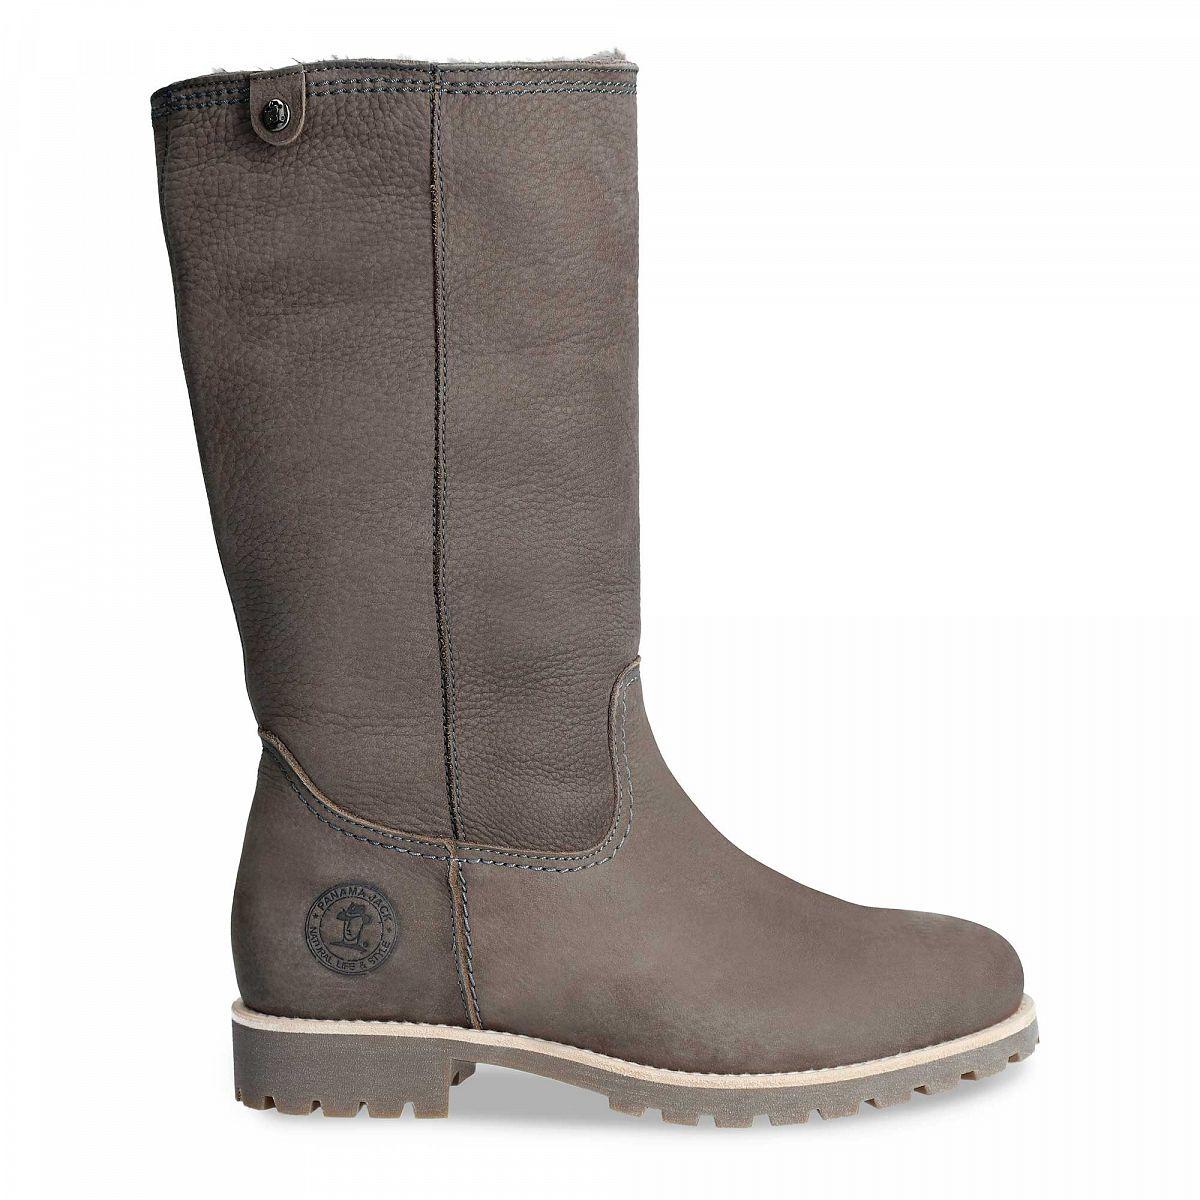 35934bdc32046 Women s boot BAMBINA IGLOO grey